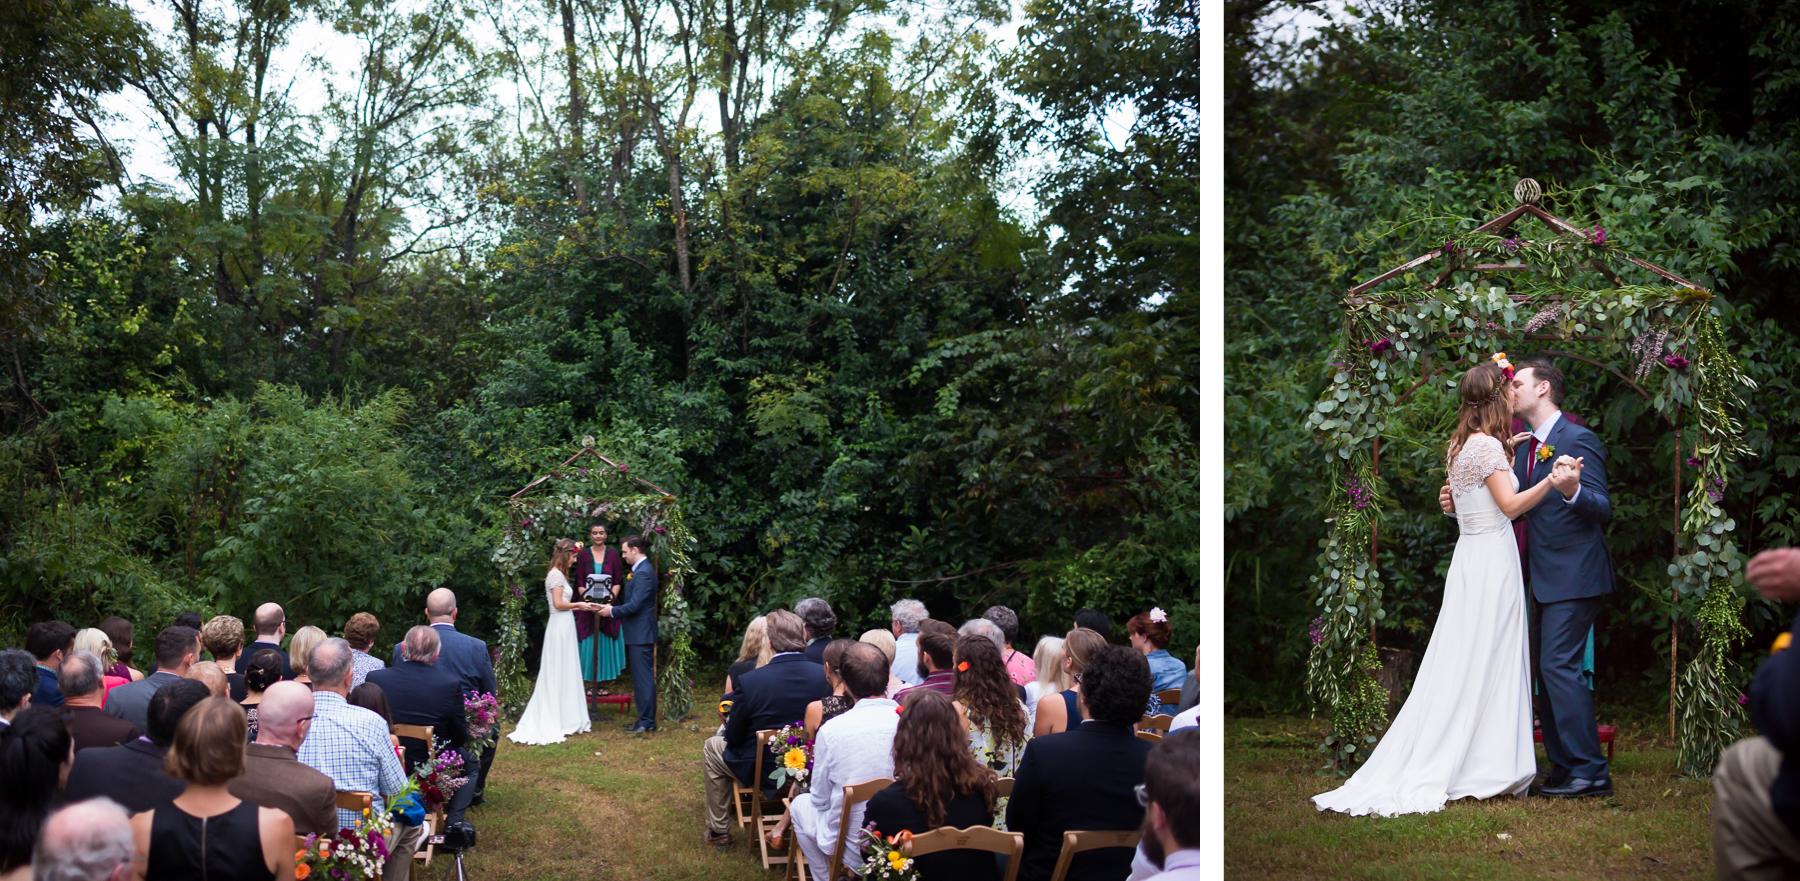 flower-toss-wedding-ceremony.jpg